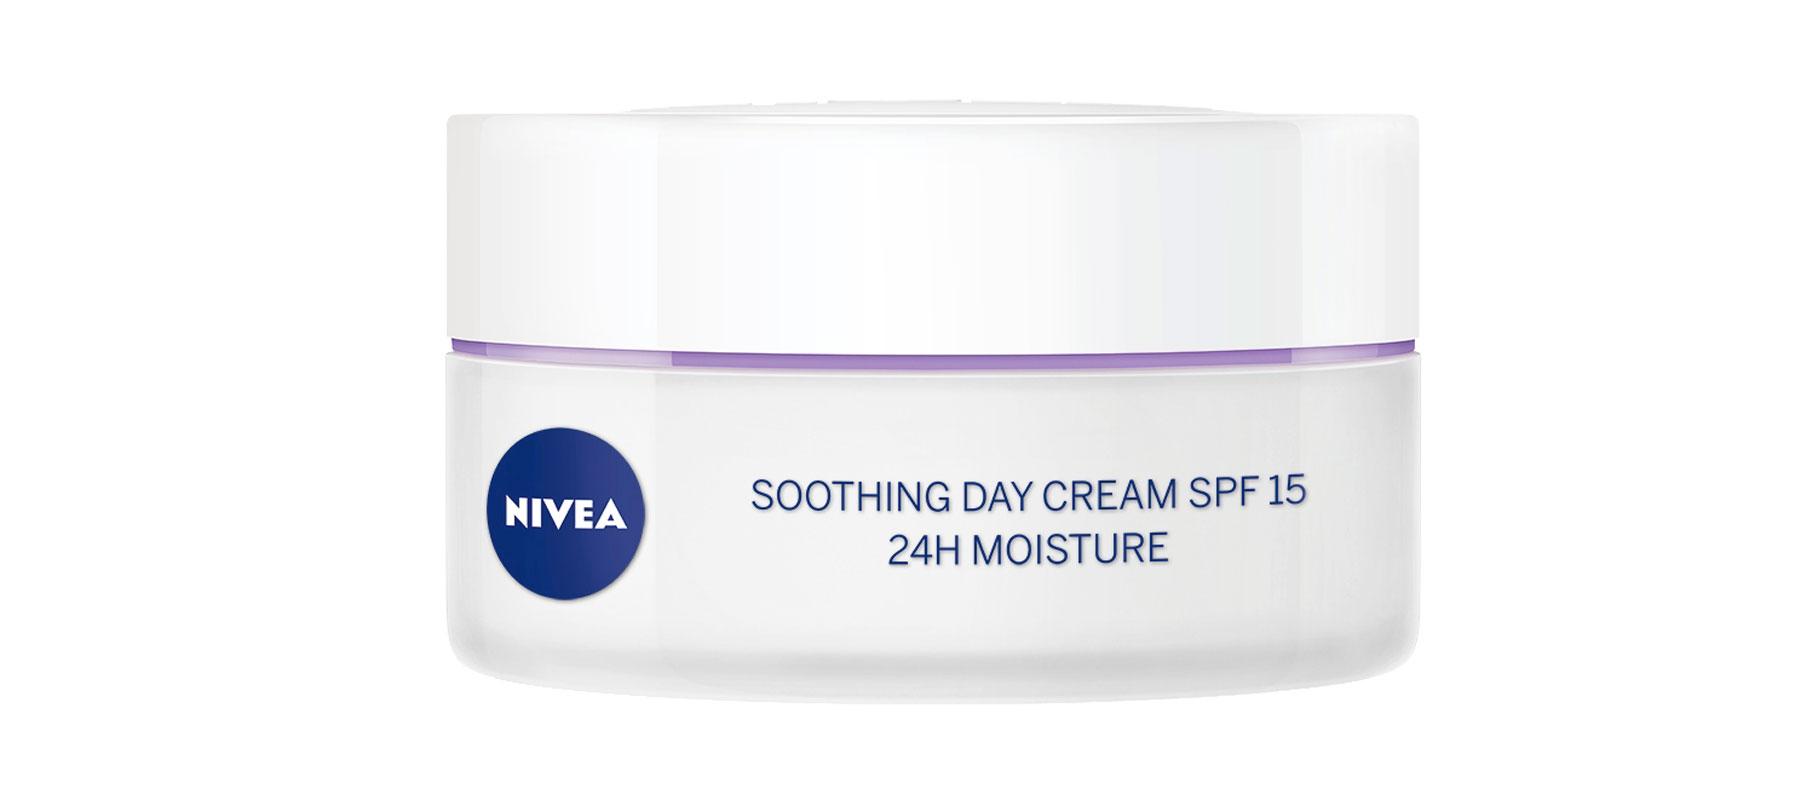 Nivea Sensitive Soothing Day Cream SPF 15